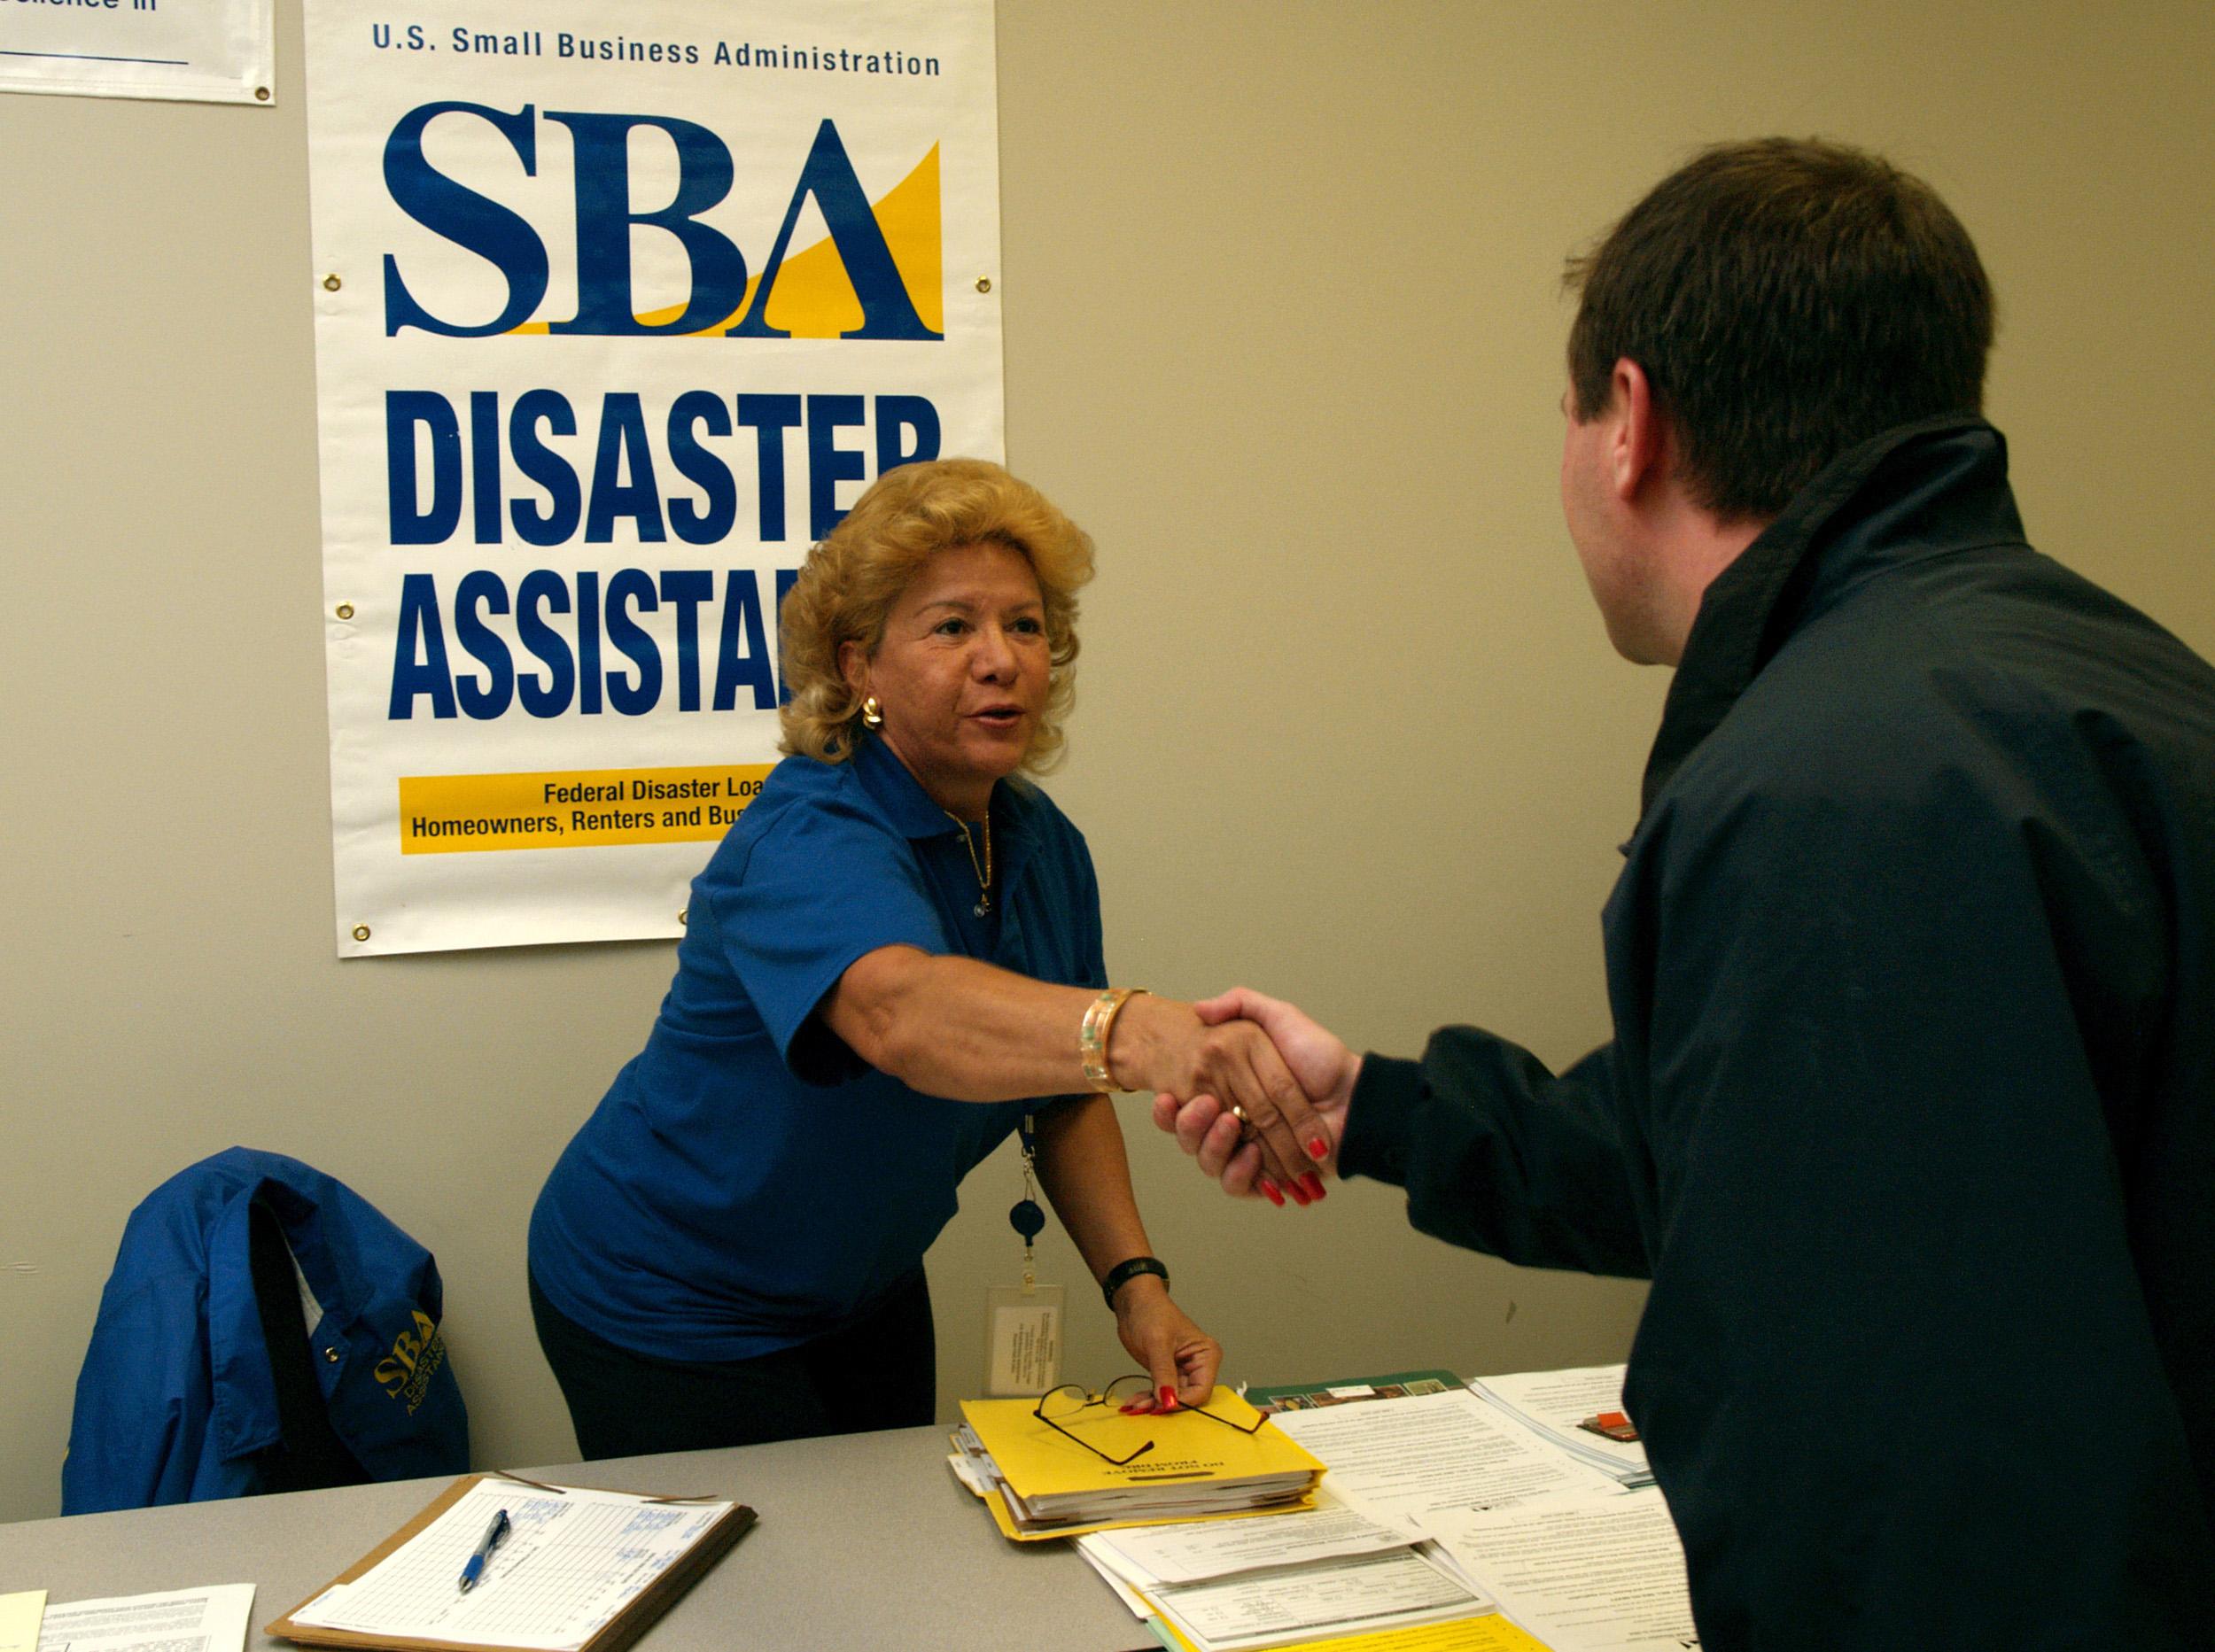 FEMA_-_30747_-_SBA_worker_shakes_hands_with_FCO_in_South_Dakota.jpg